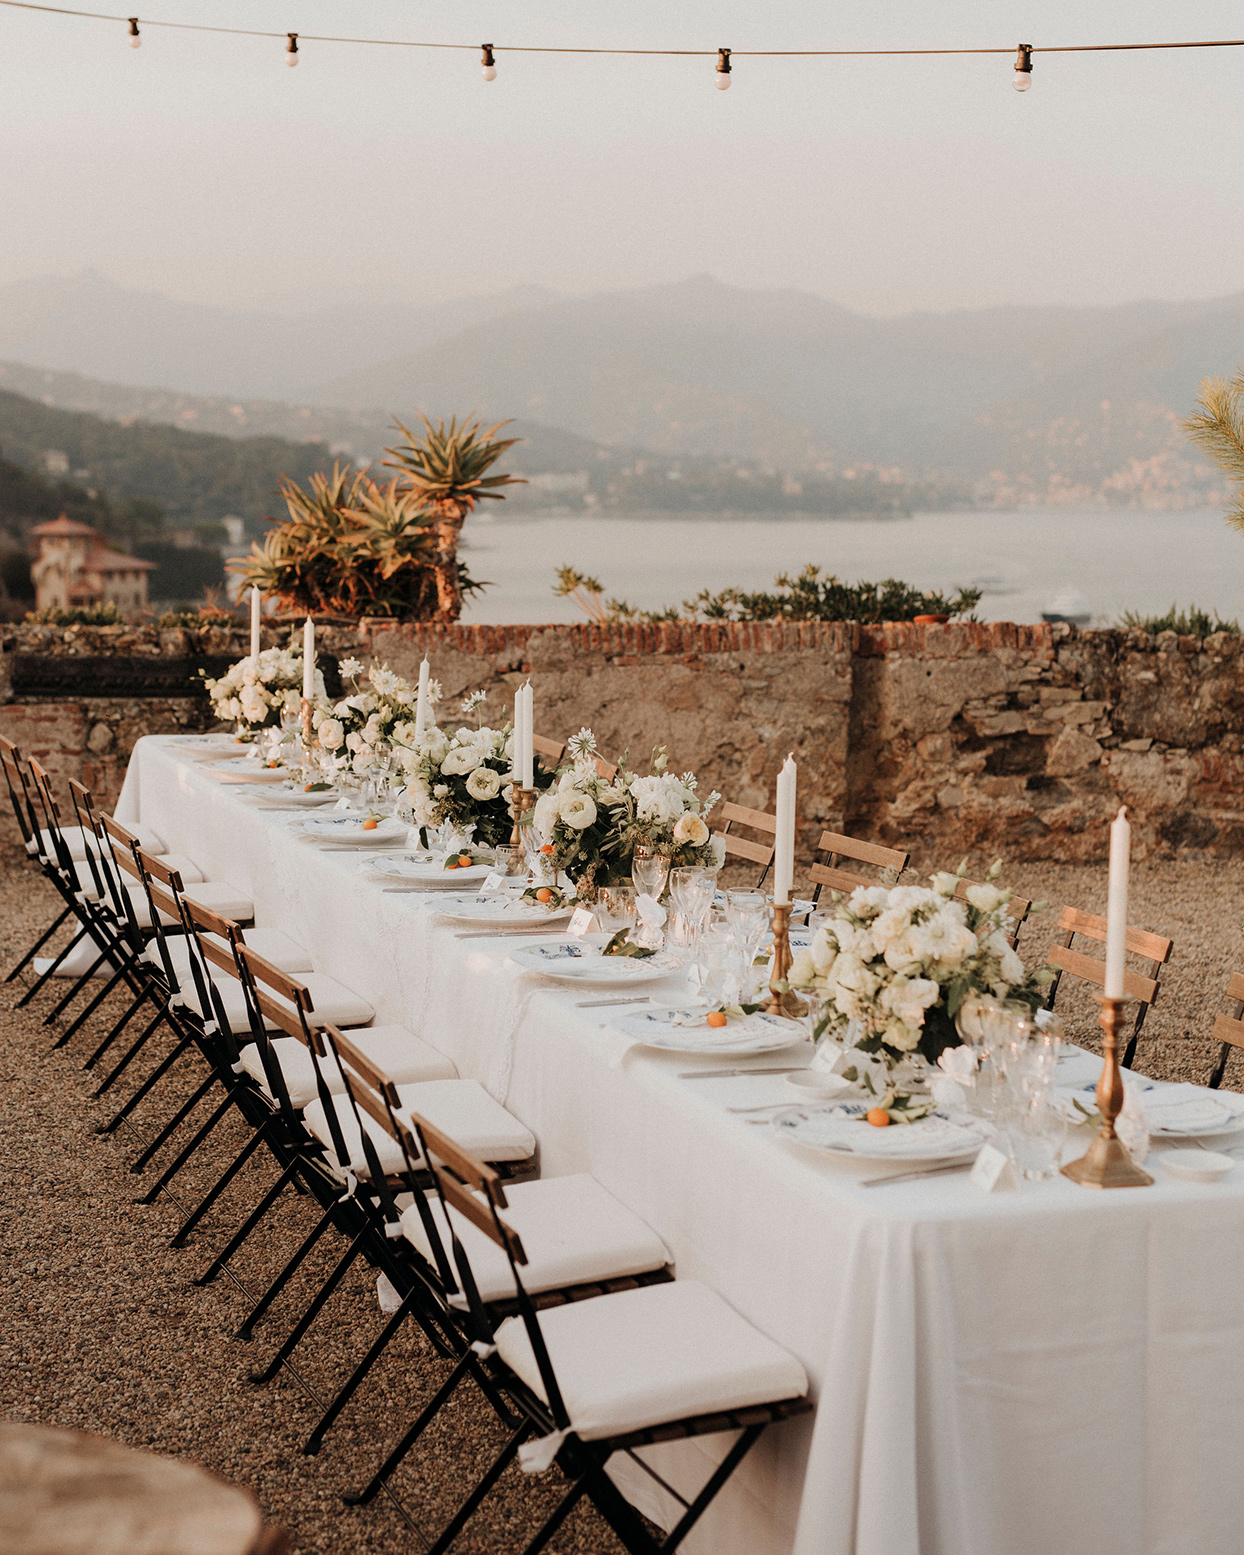 jaclyn antonio wedding reception long table overlooking water